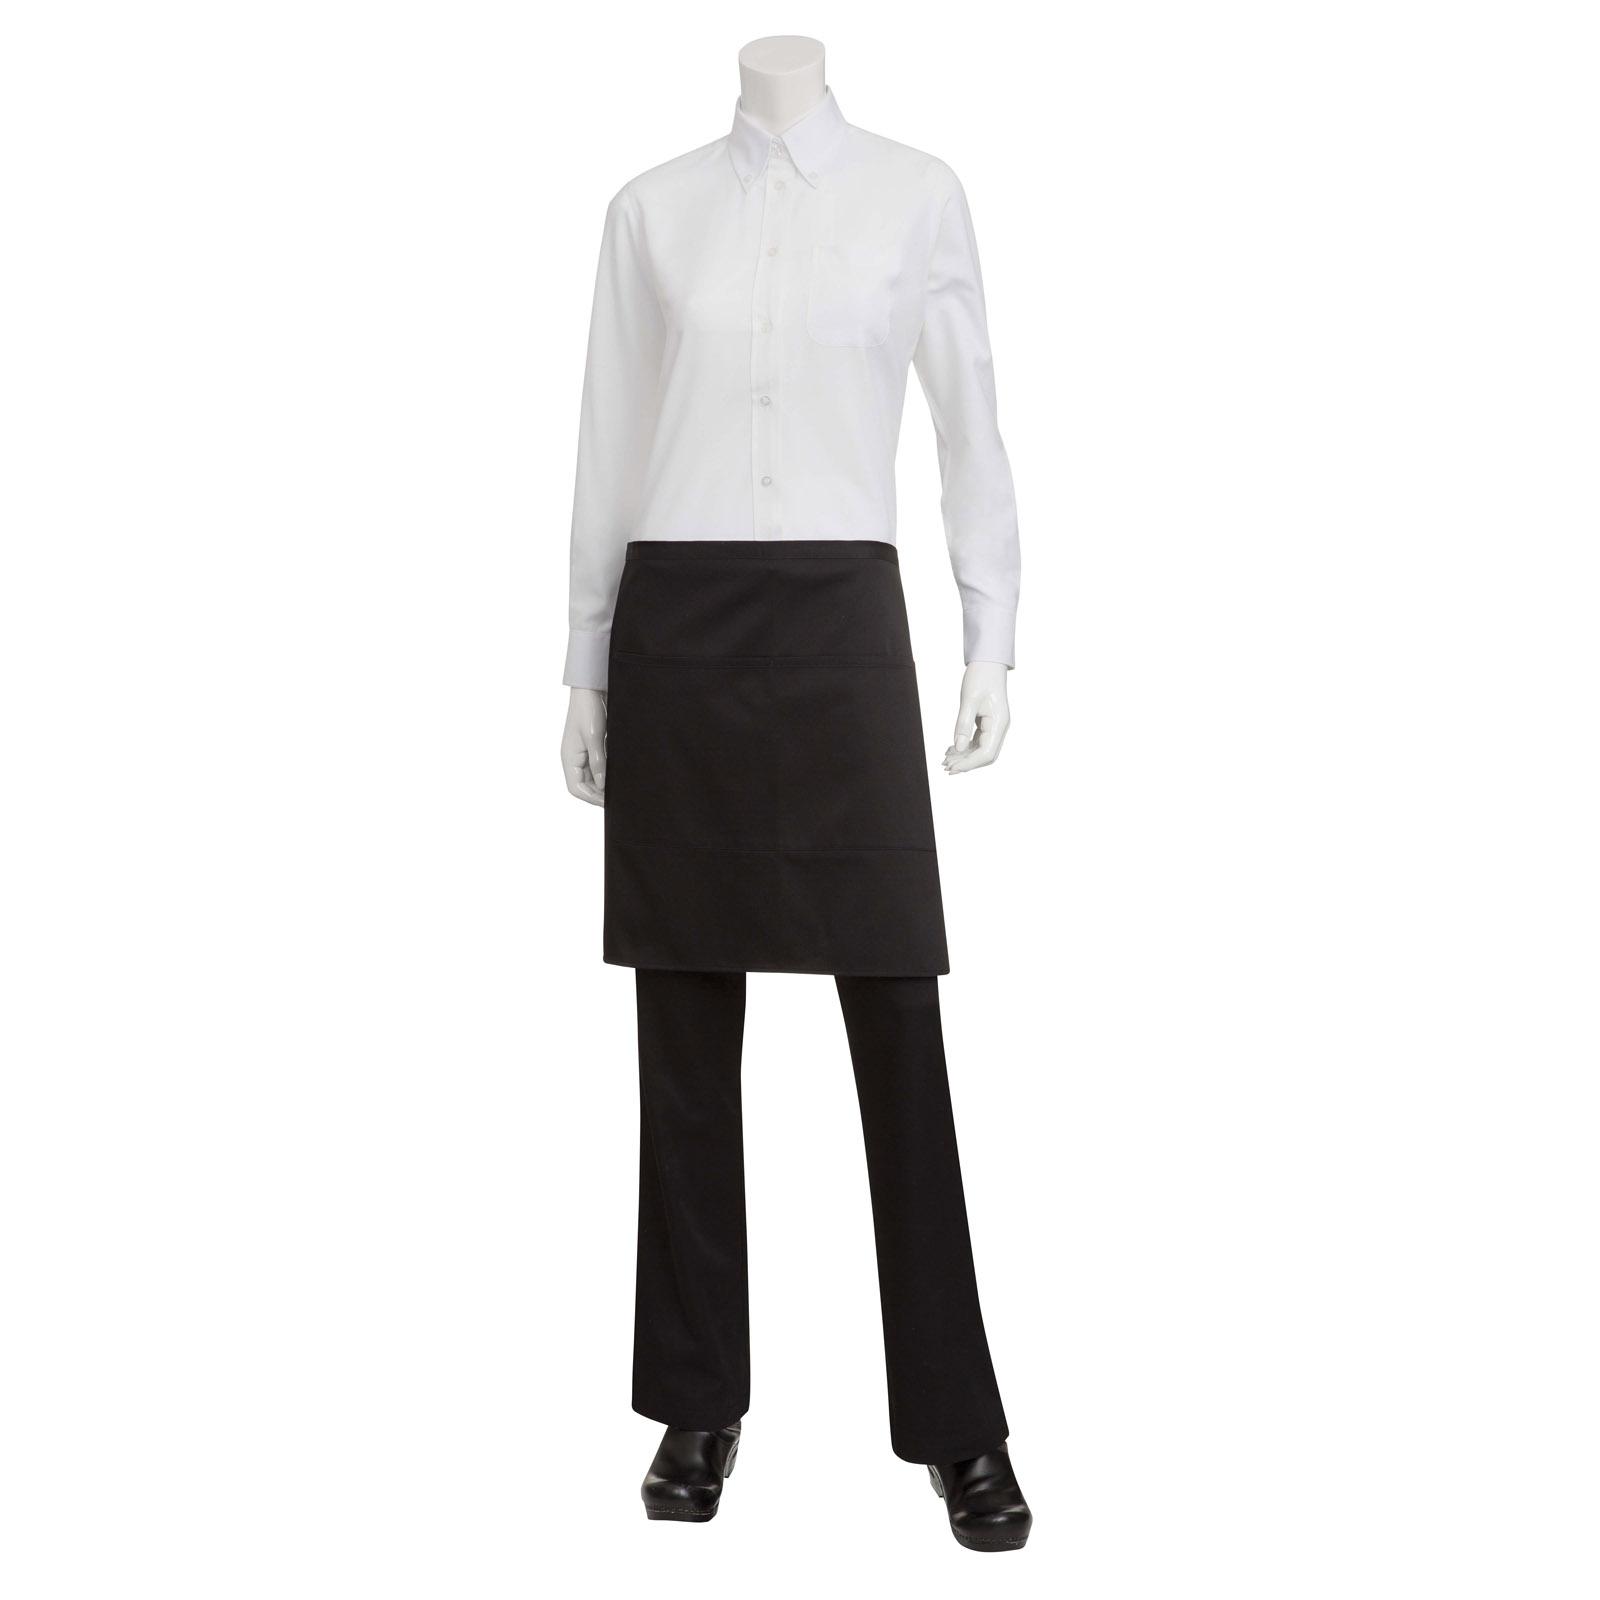 Chef Works F28 BLK0 waist apron